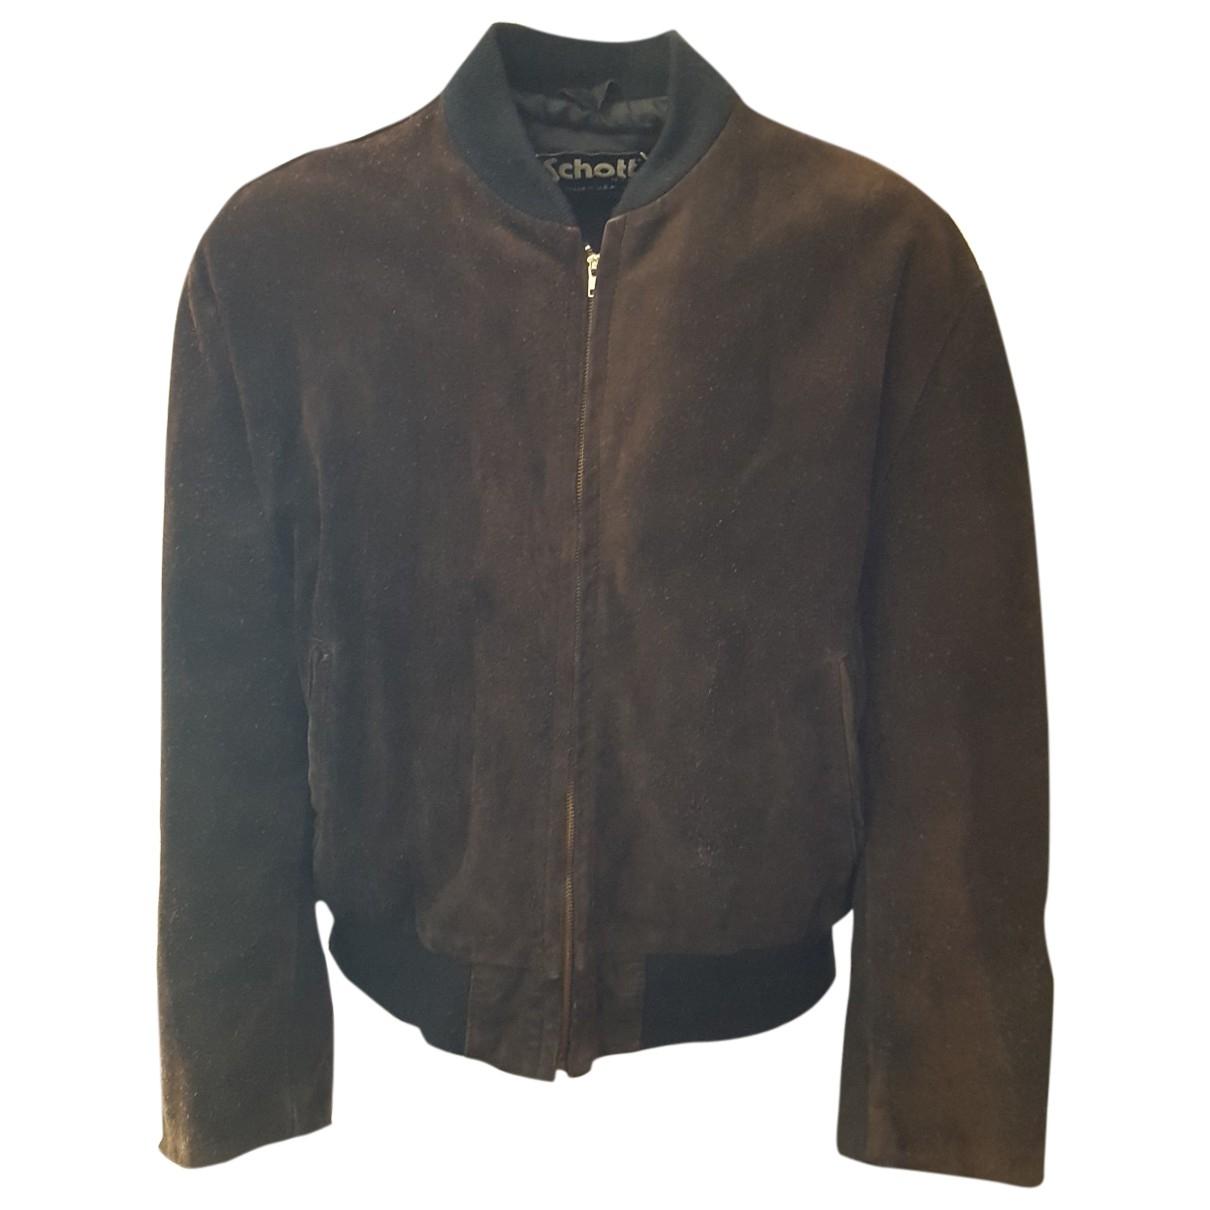 Schott \N Brown Leather jacket  for Men L International